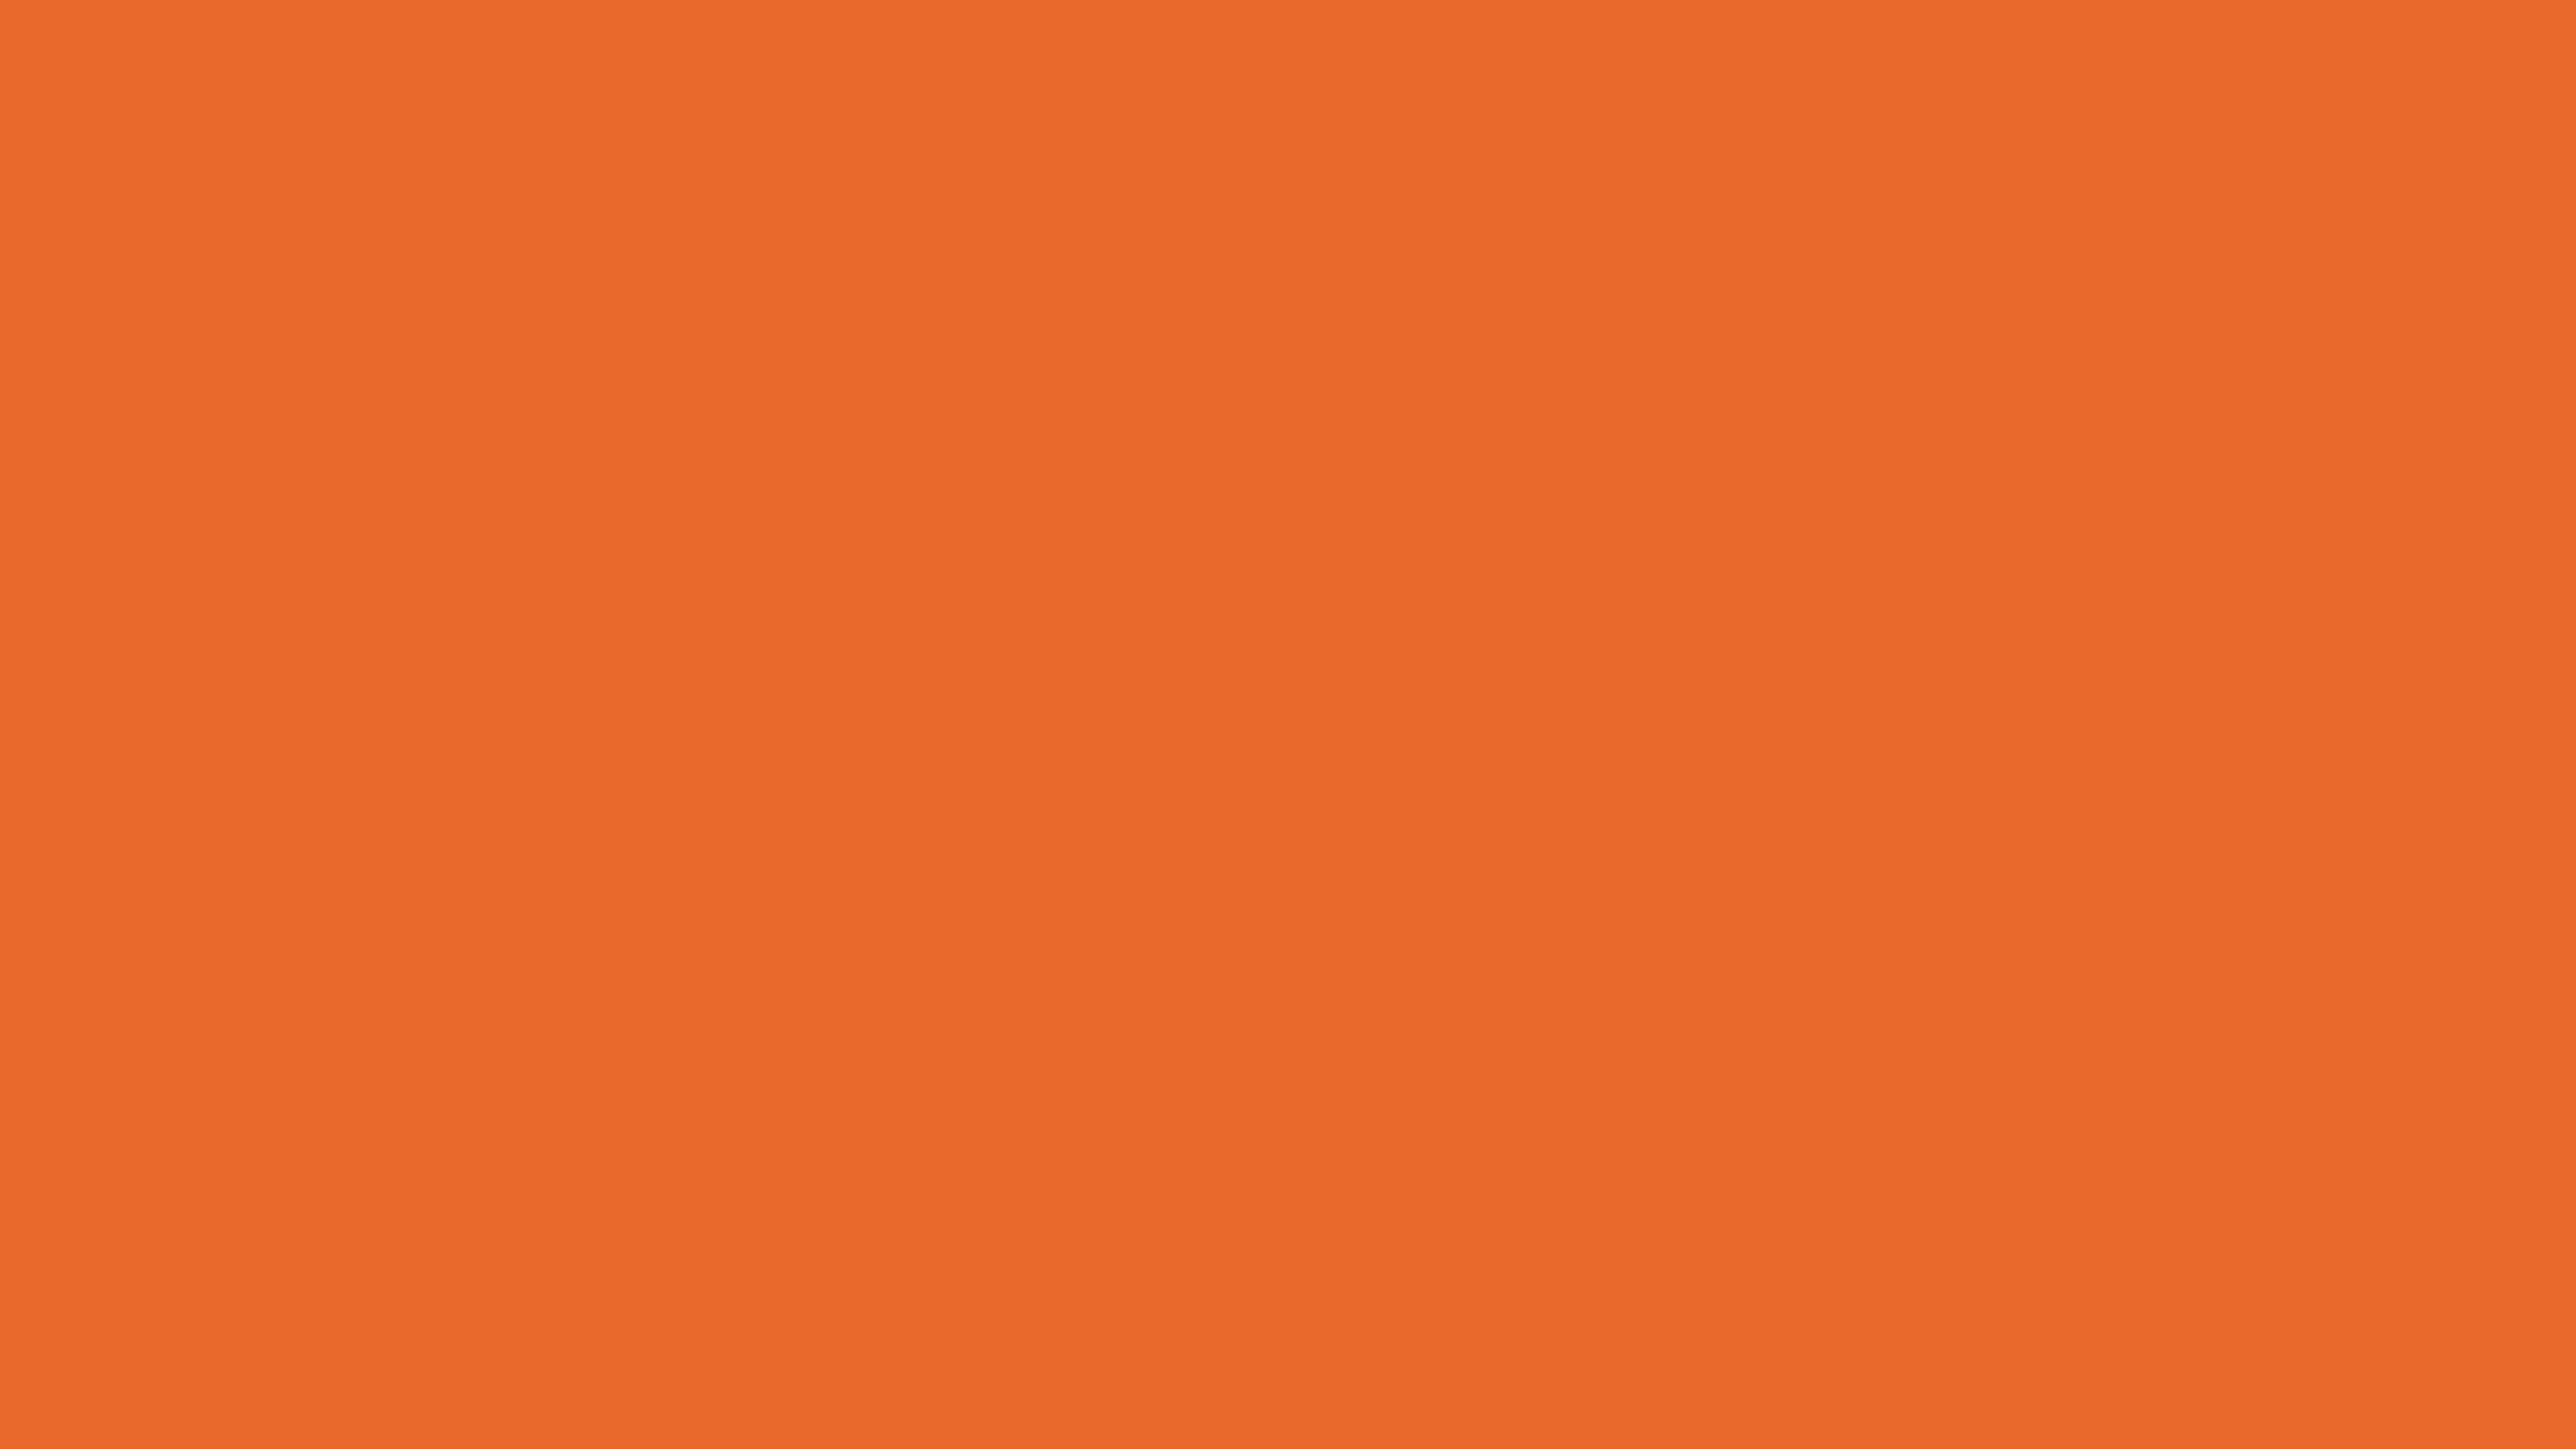 4096x2304 Deep Carrot Orange Solid Color Background